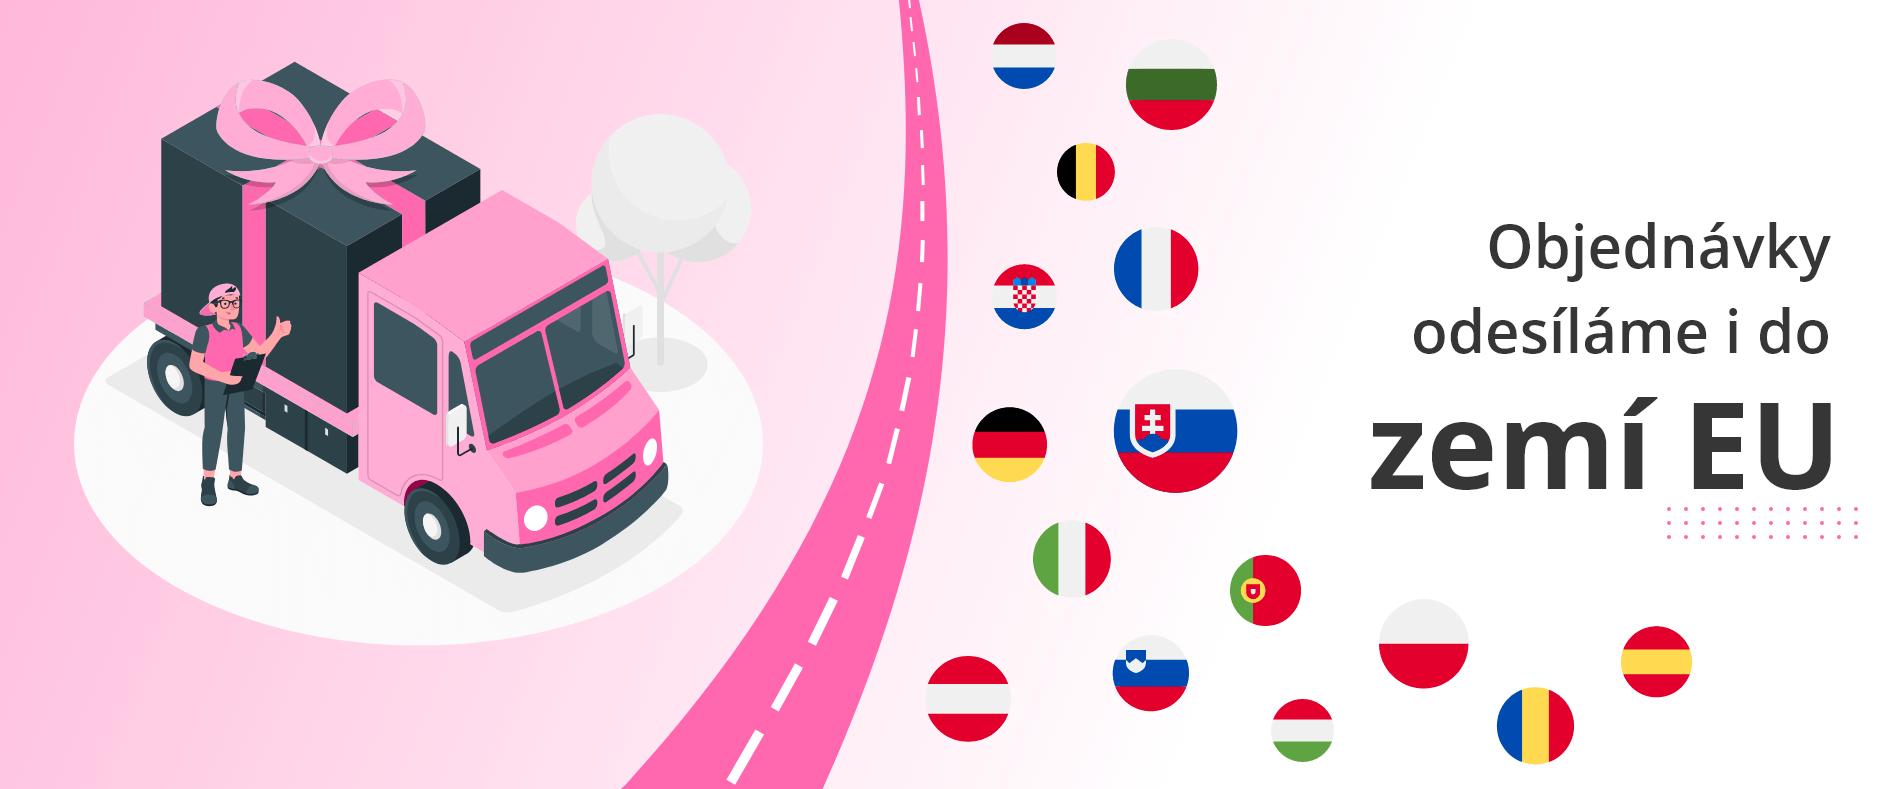 Odesíláme do zemí EU